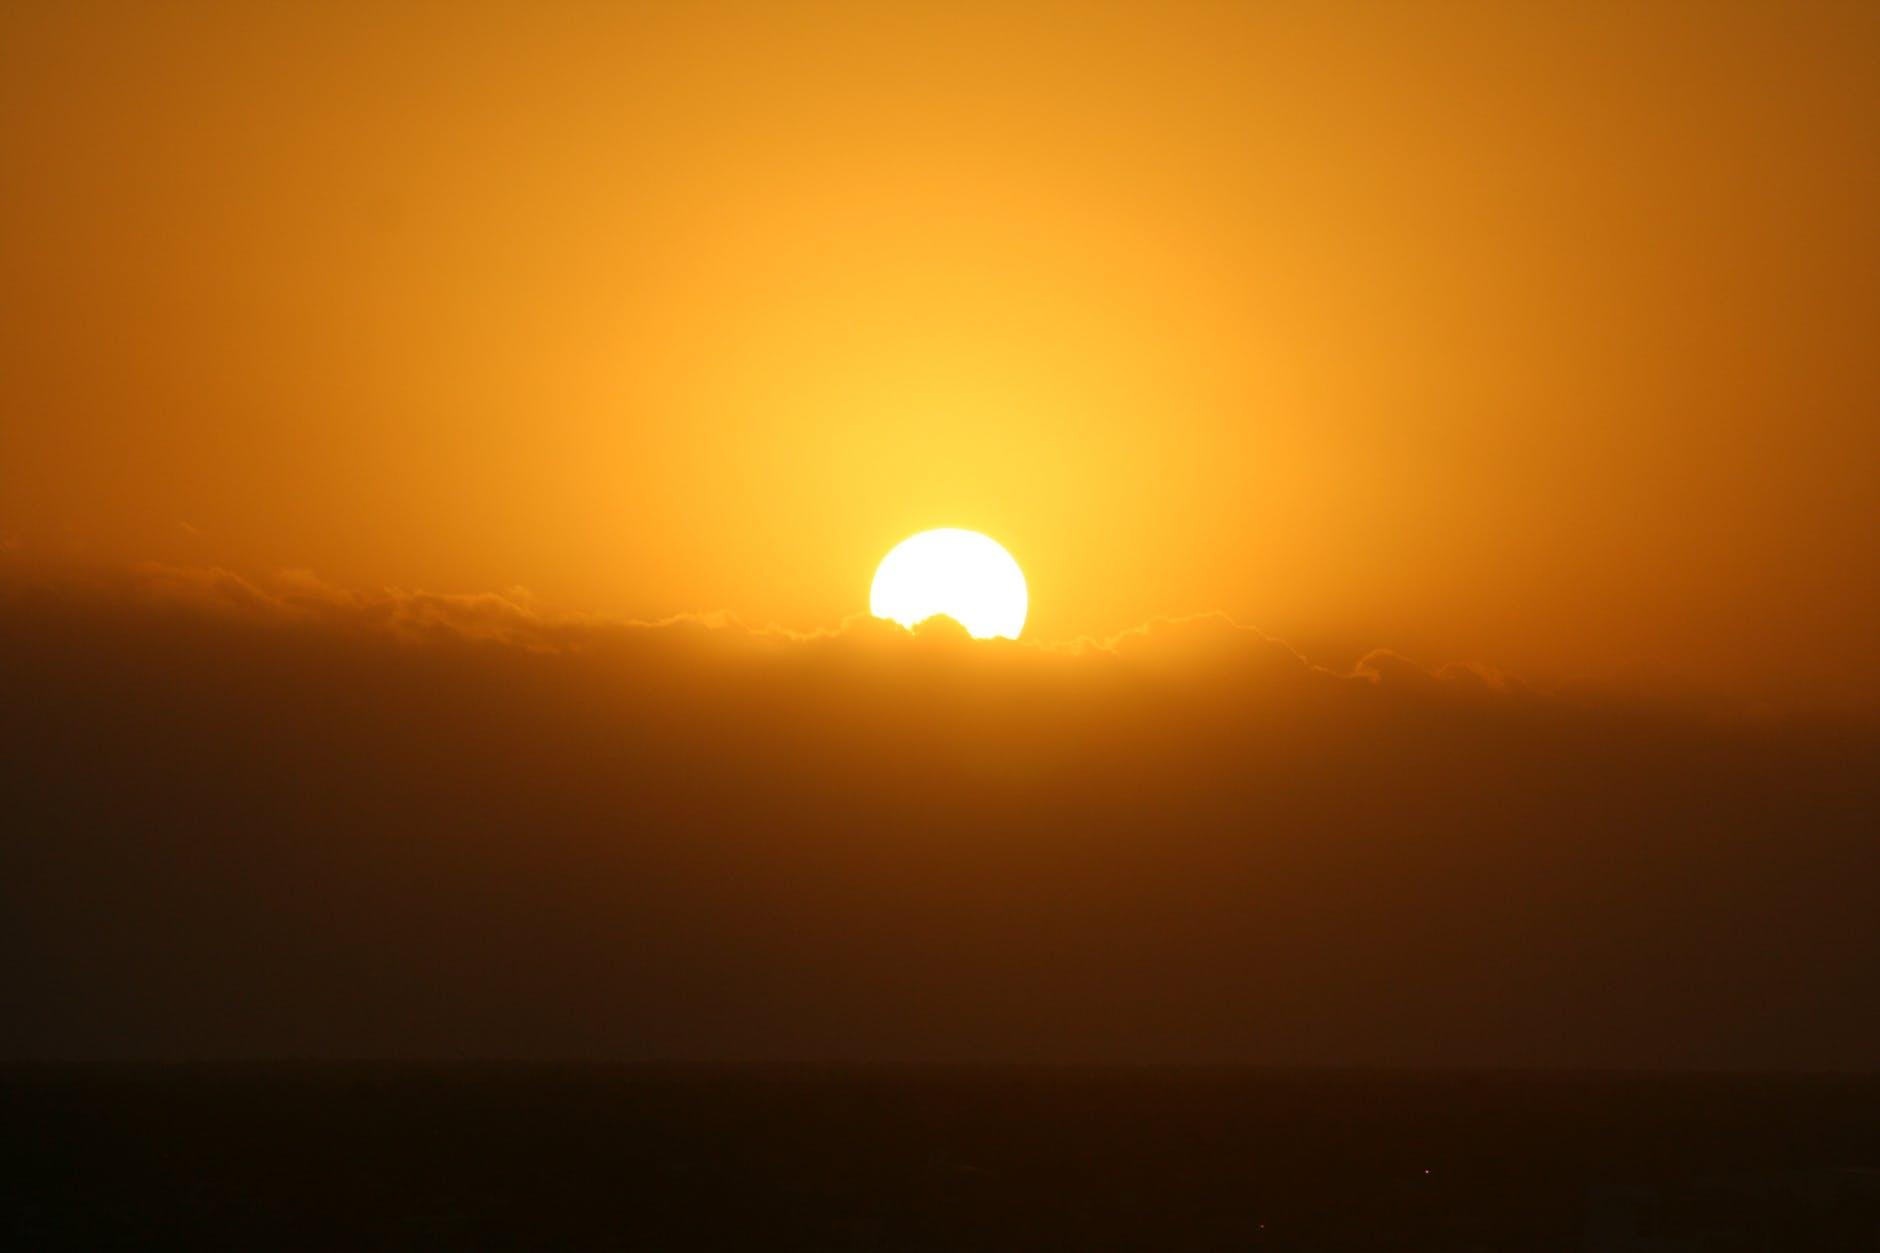 sun during excessive heat